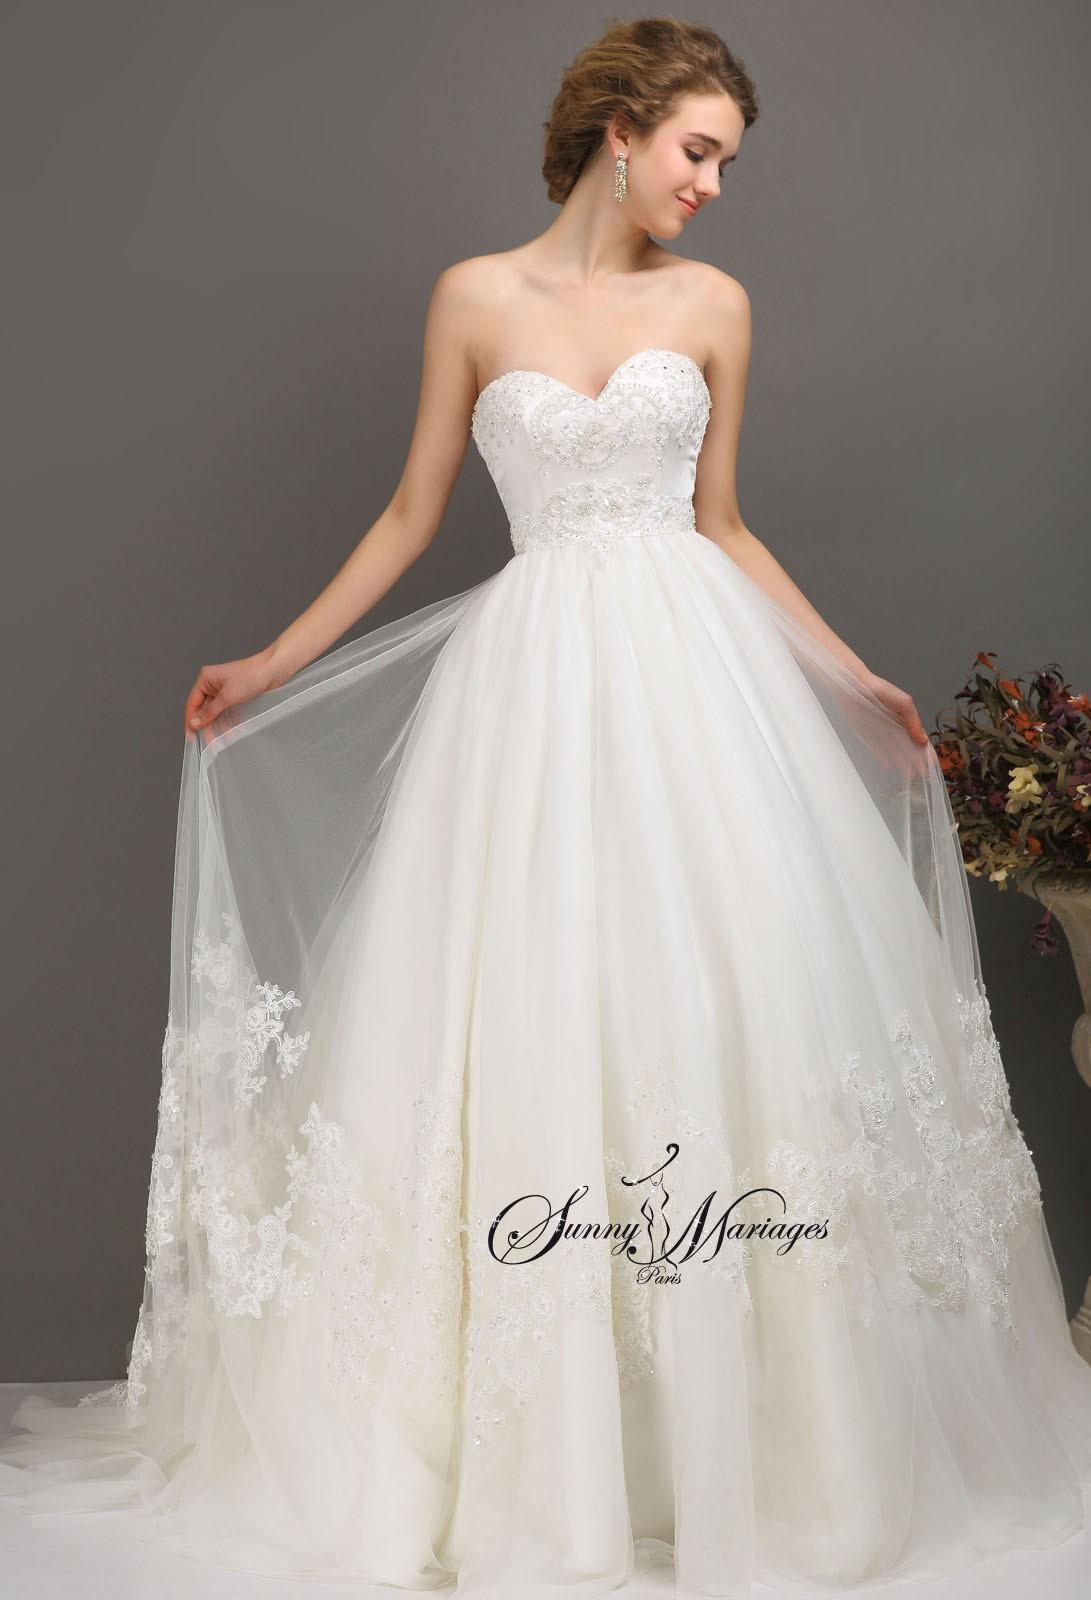 ... Mariage » robe de mariée » robe de mariee empire bustier « Nira